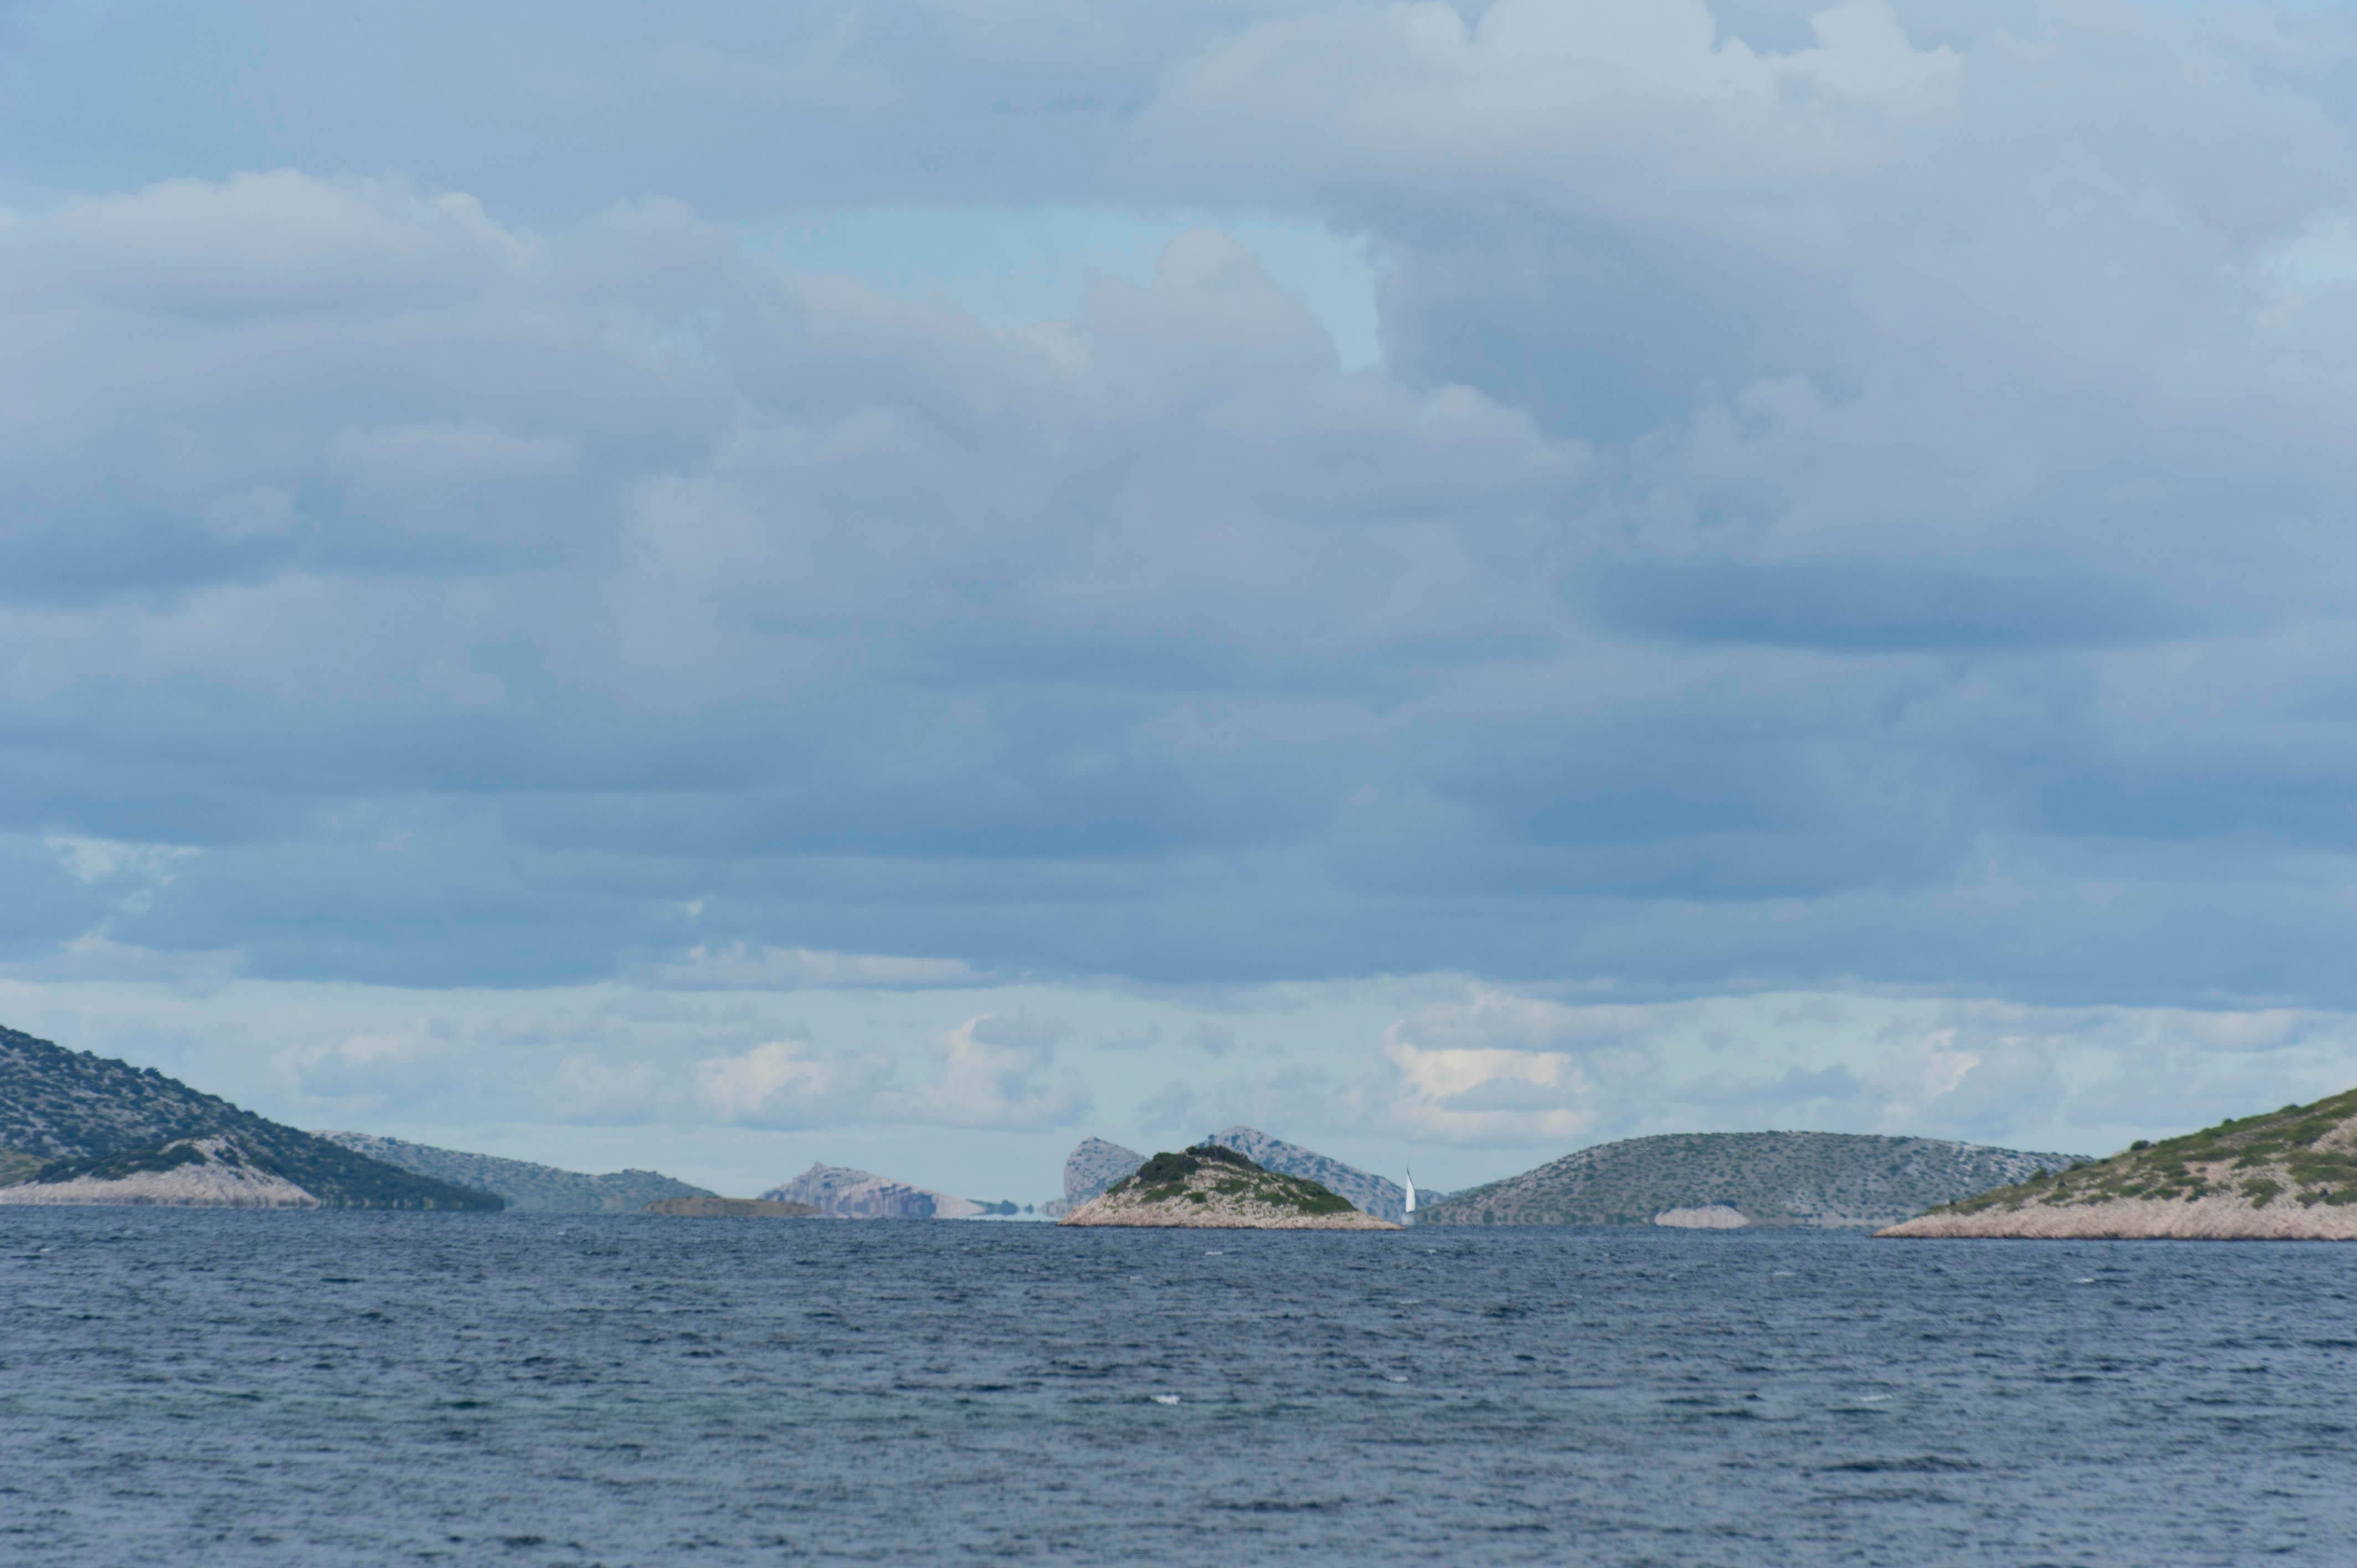 9623-Parc national iles Kornati (Dalmatie du Nord)